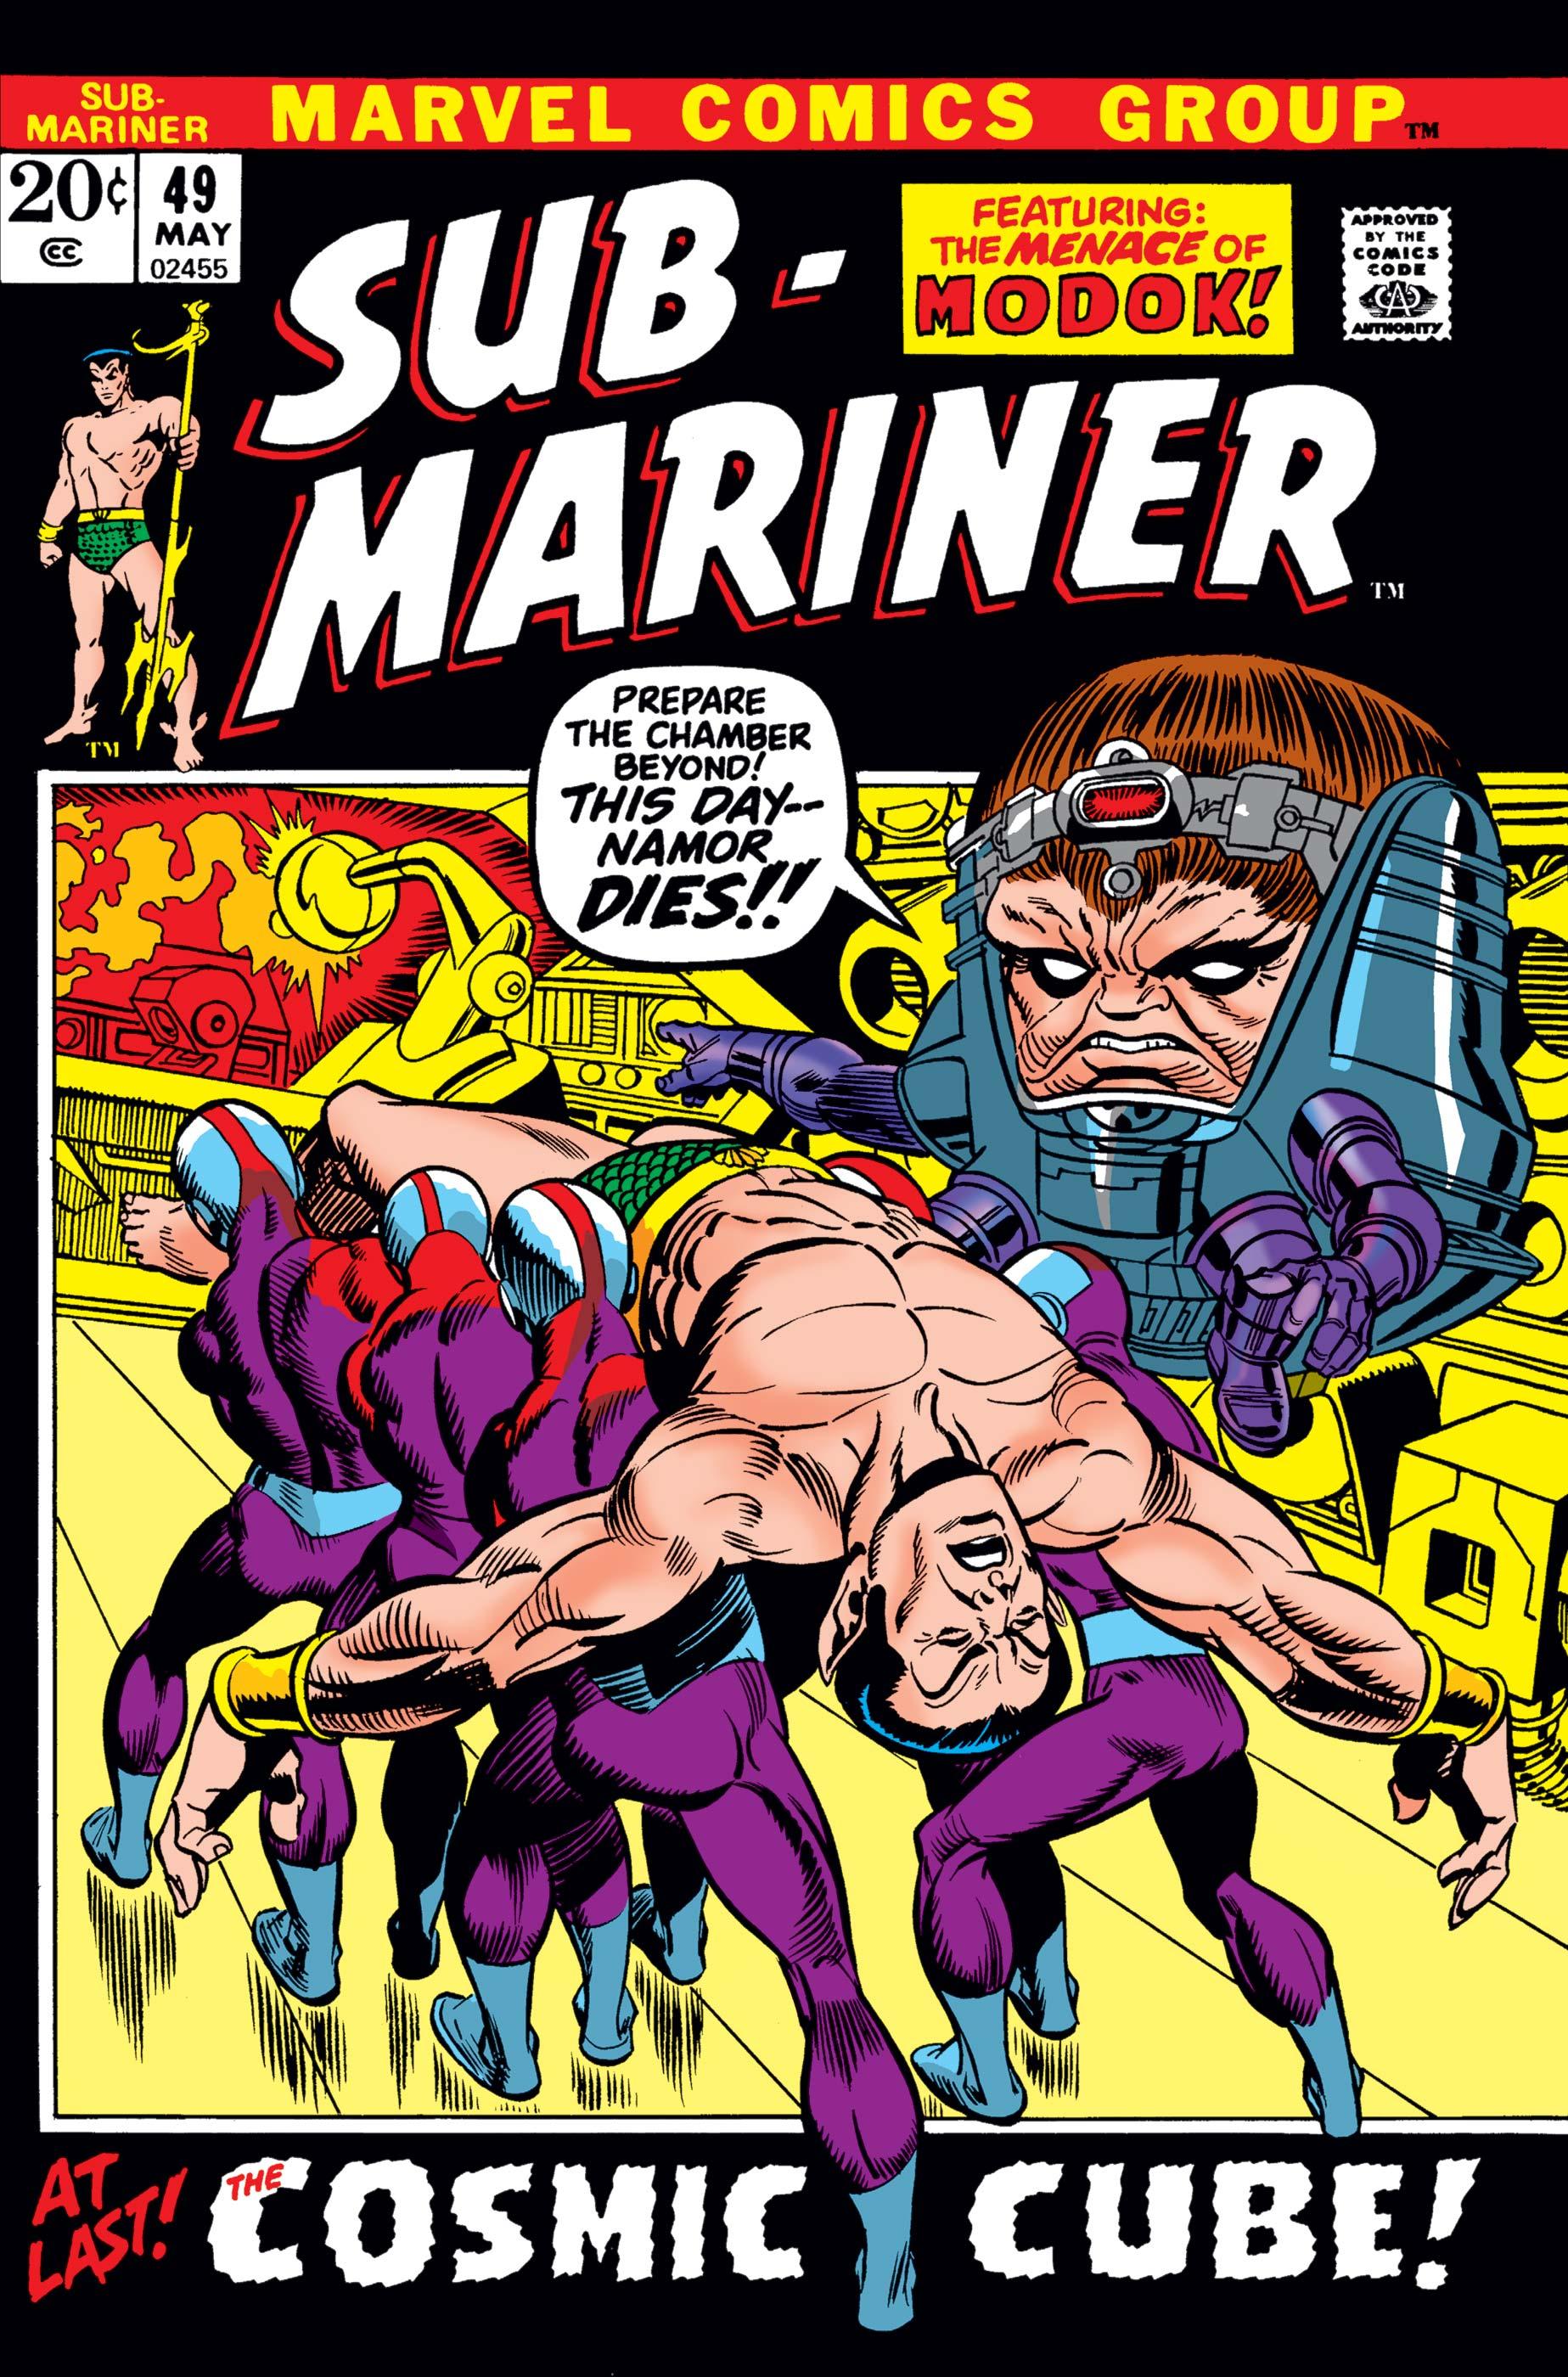 Sub-Mariner (1968) #49